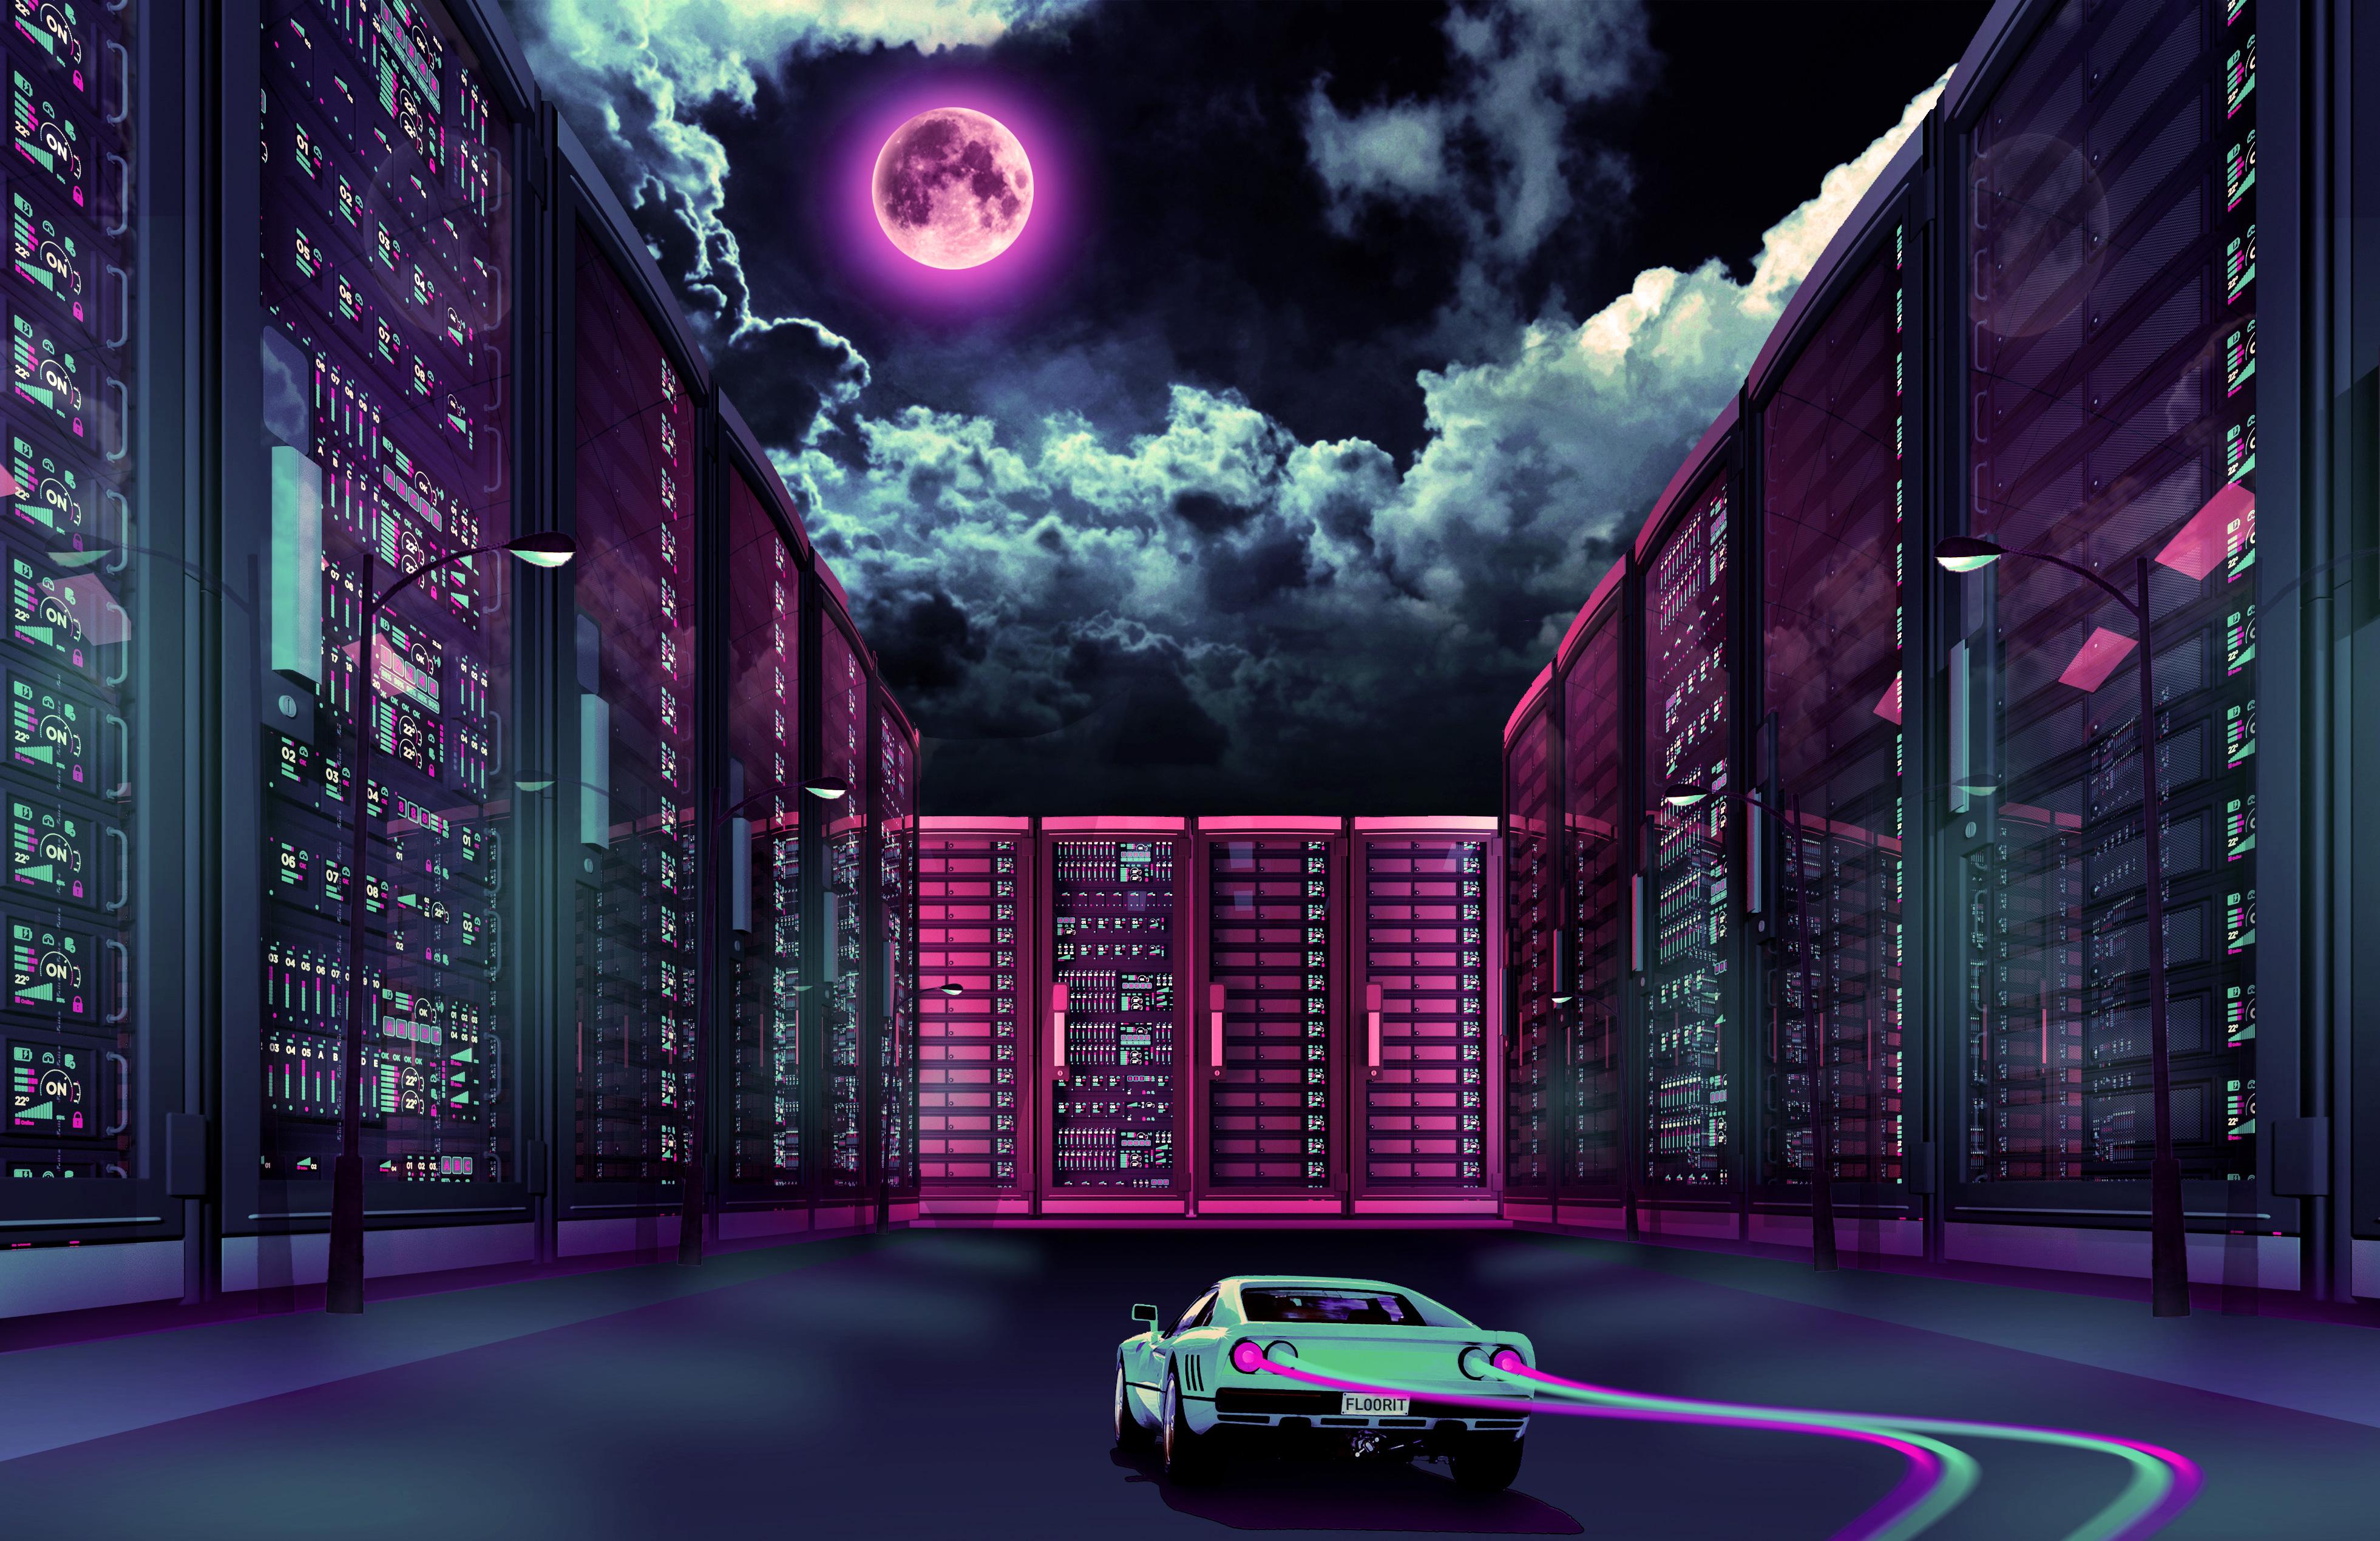 1920x1080 Retrowave Car Going Through City Moon Laptop ...